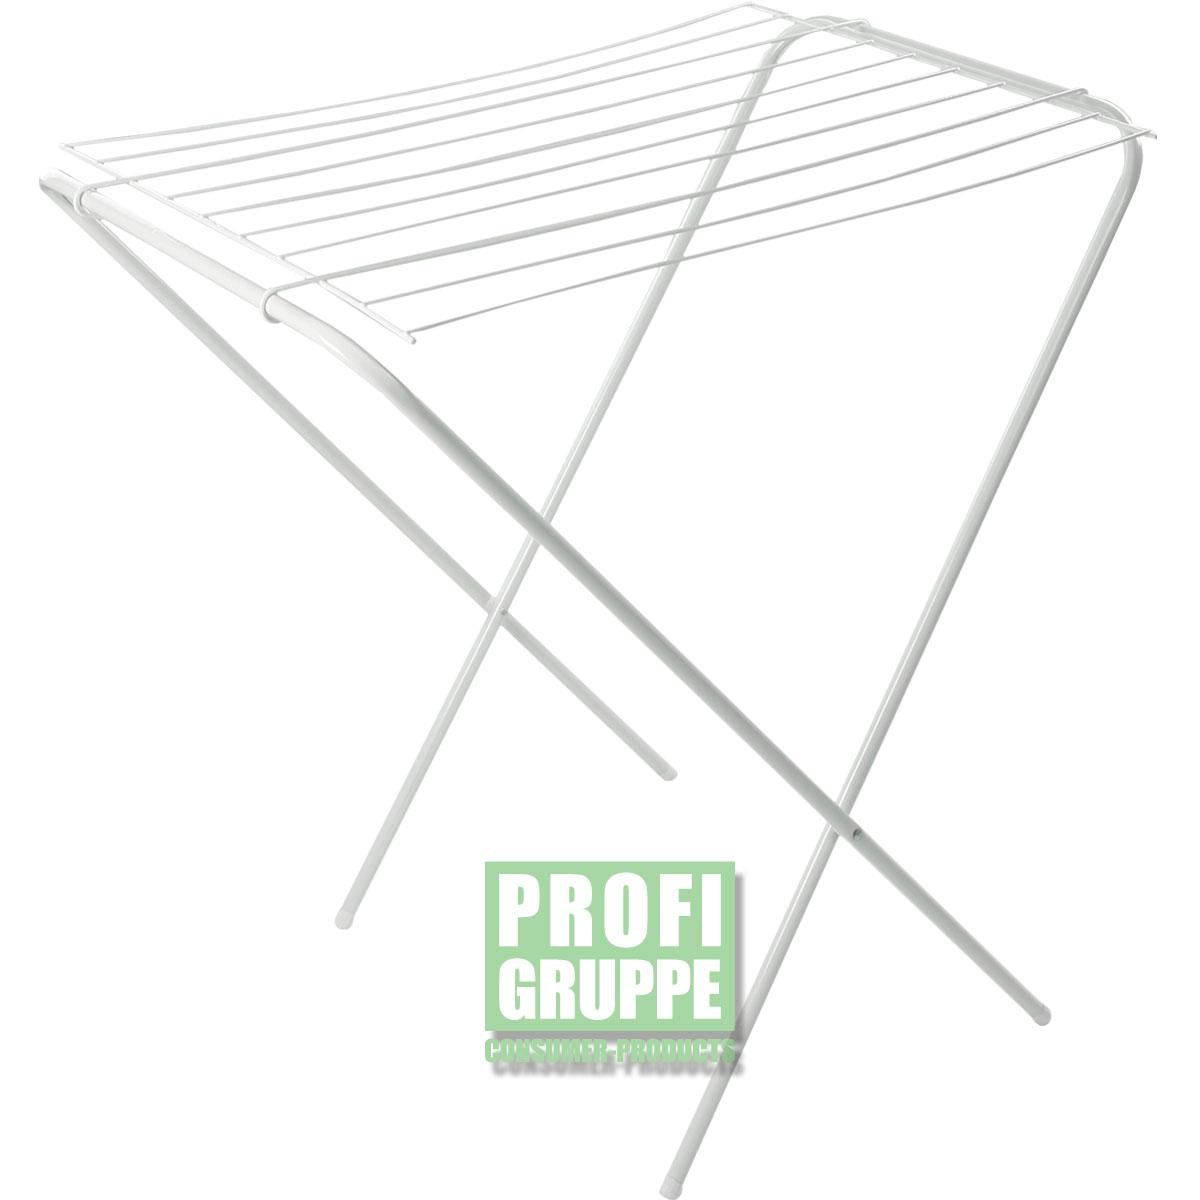 Wäscheständer Wäschetrockner Flügelwäschetrockner klappbar 8m Neu | eBay